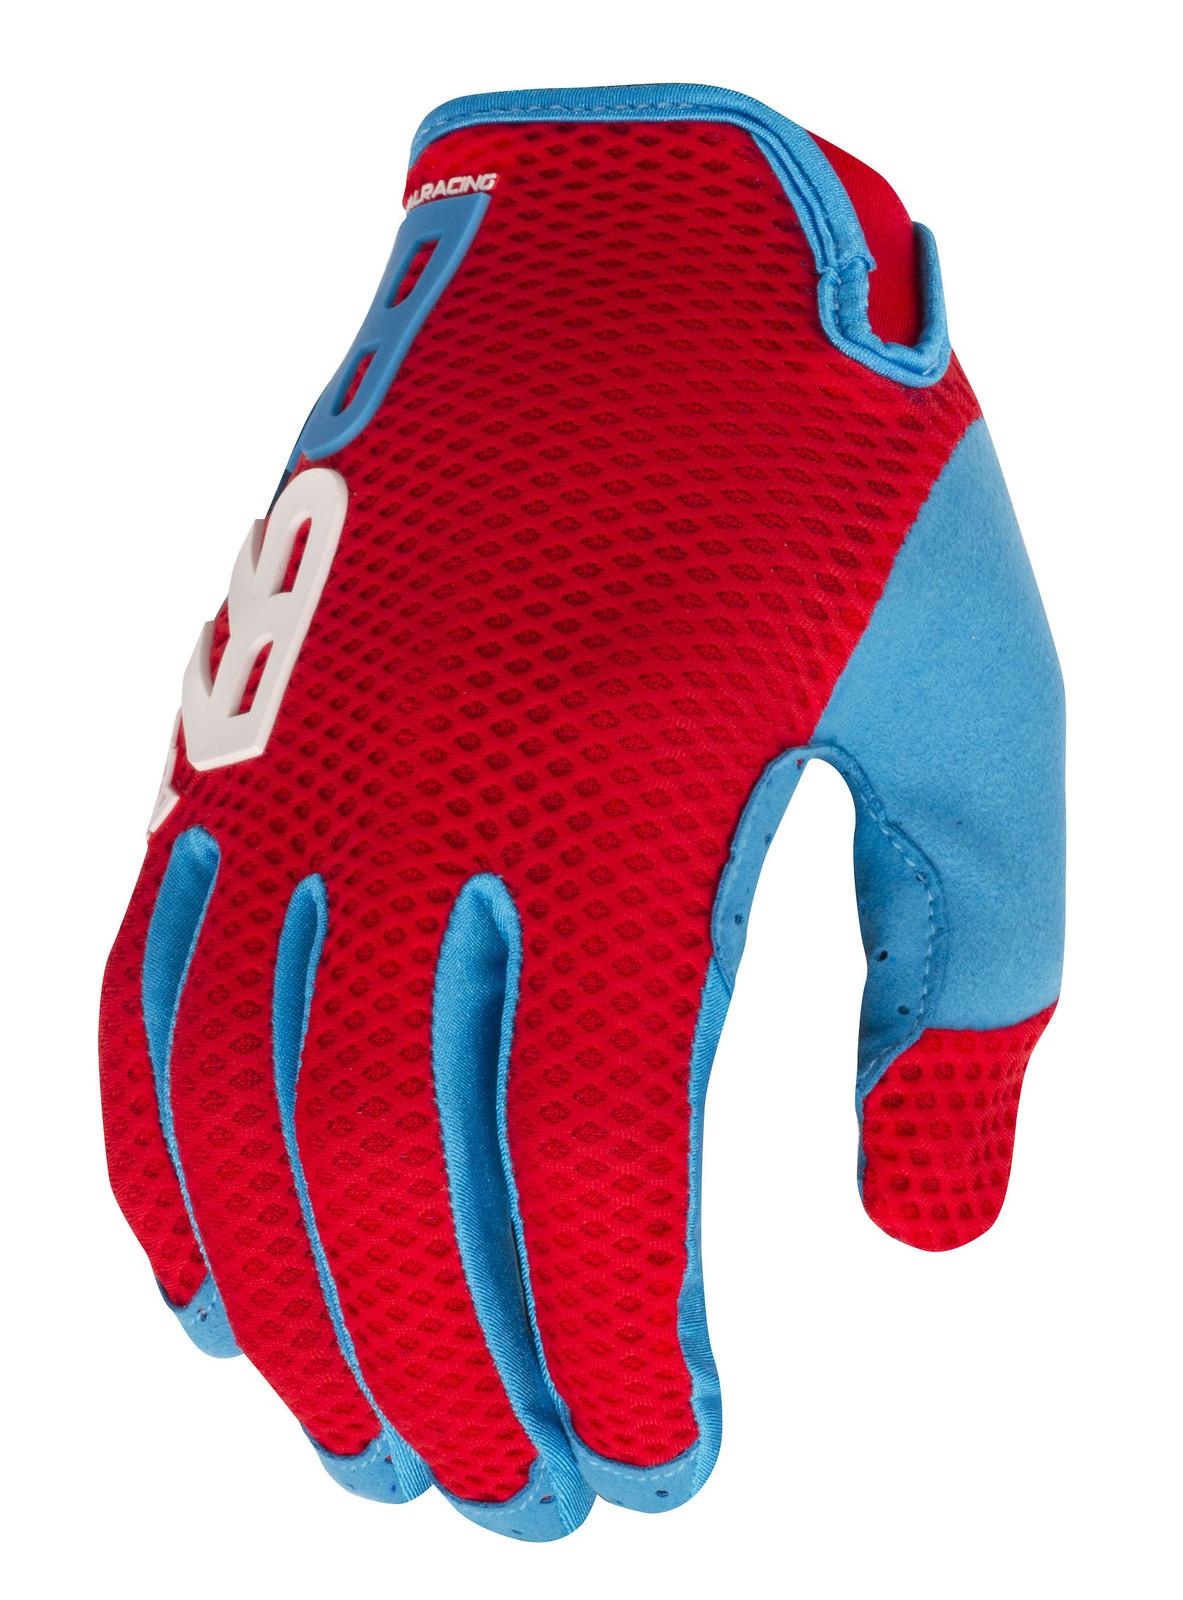 f6bb797b2 Royal 2017 Quantum Gloves - Reviews